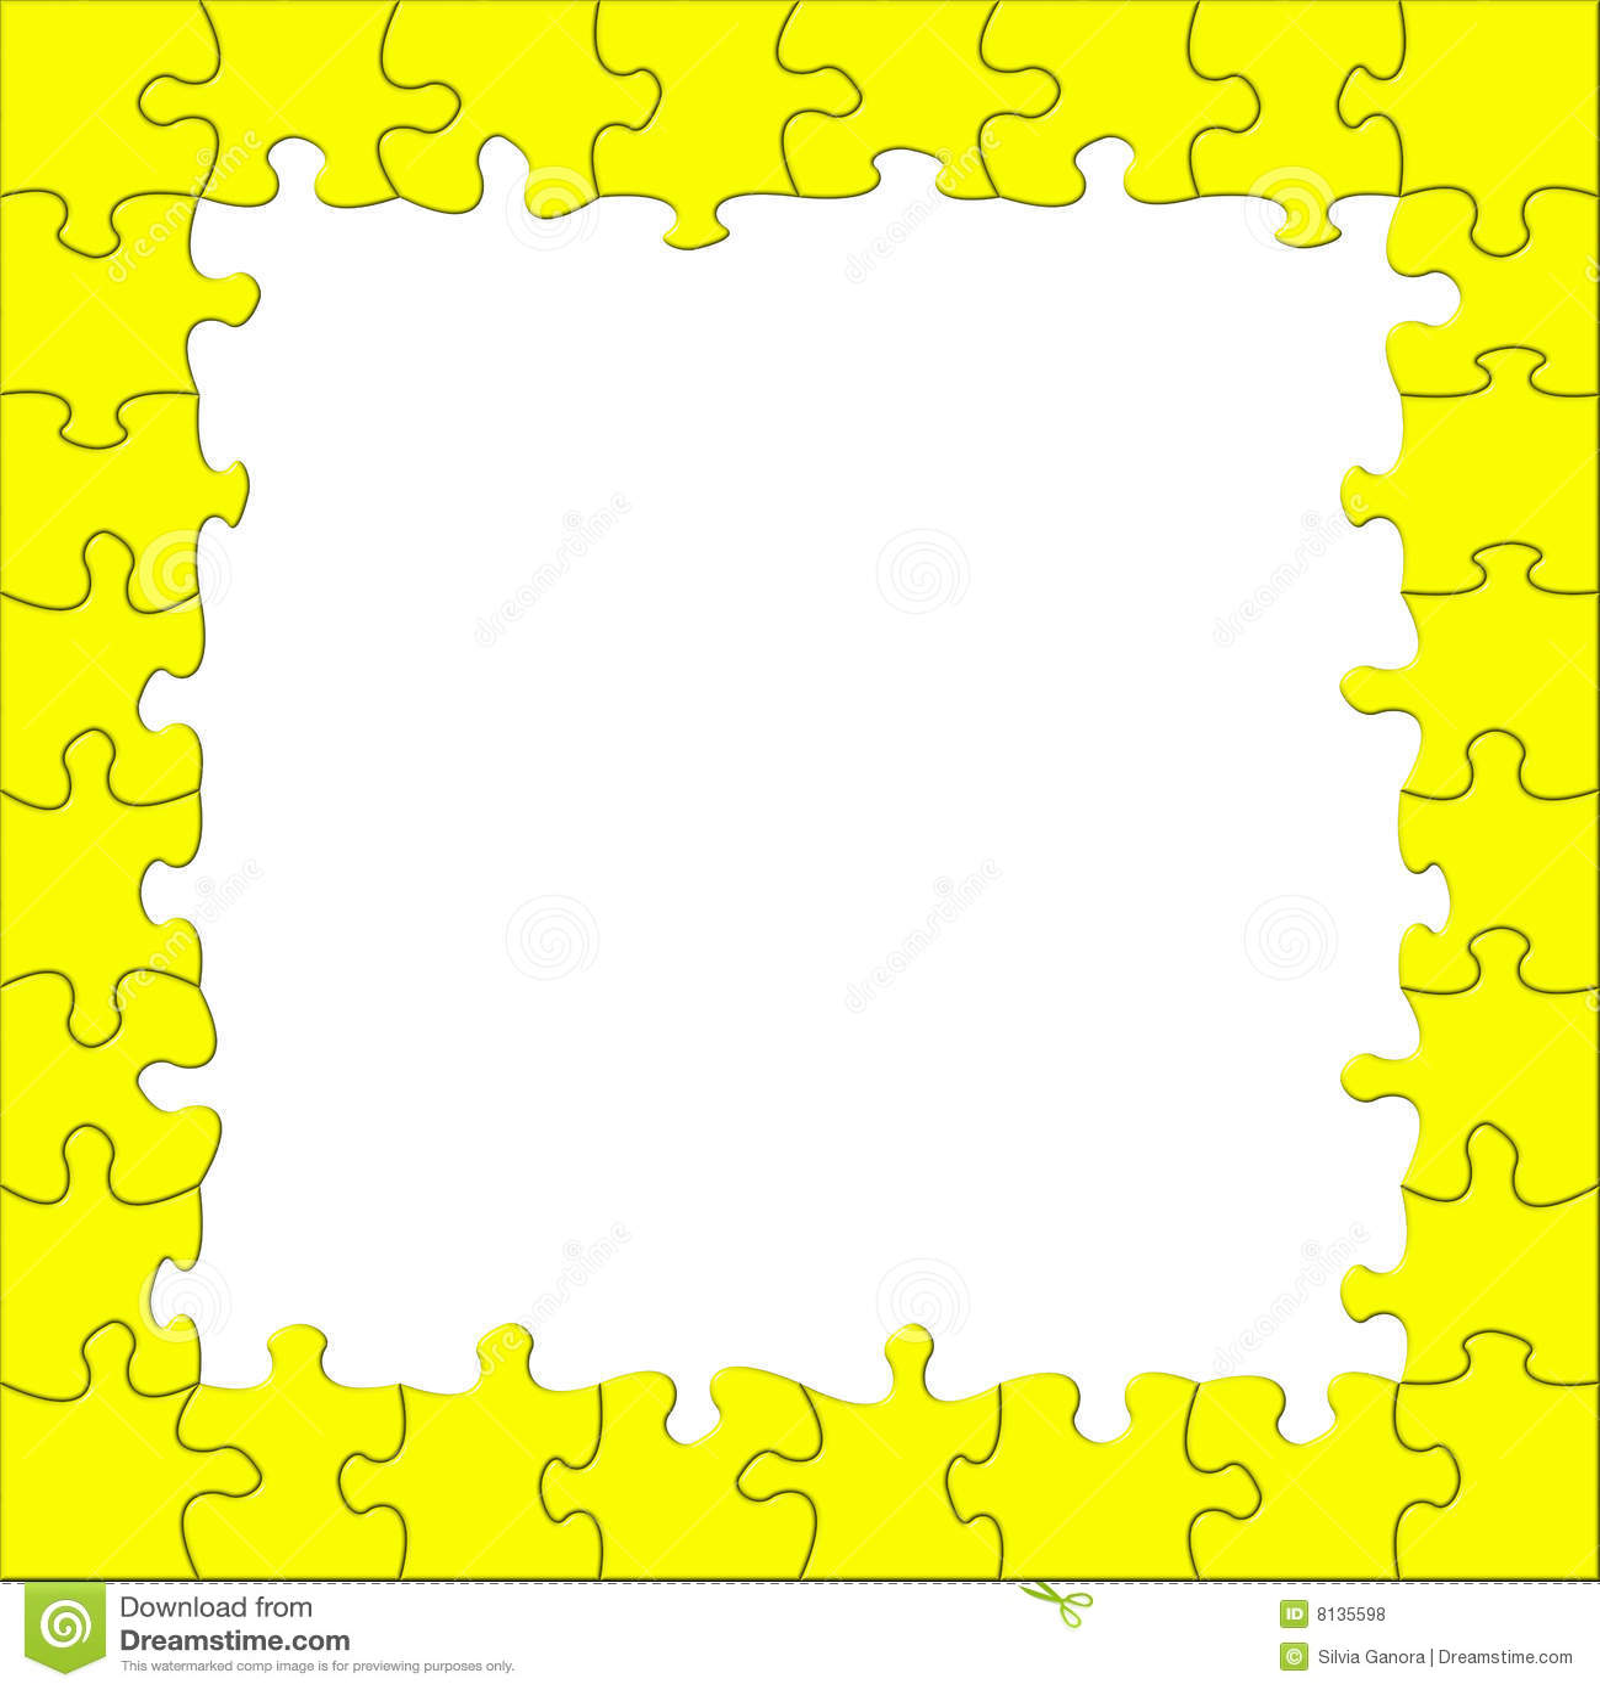 Puzzle frame stock illustration. Illustration of isolated - 8135598